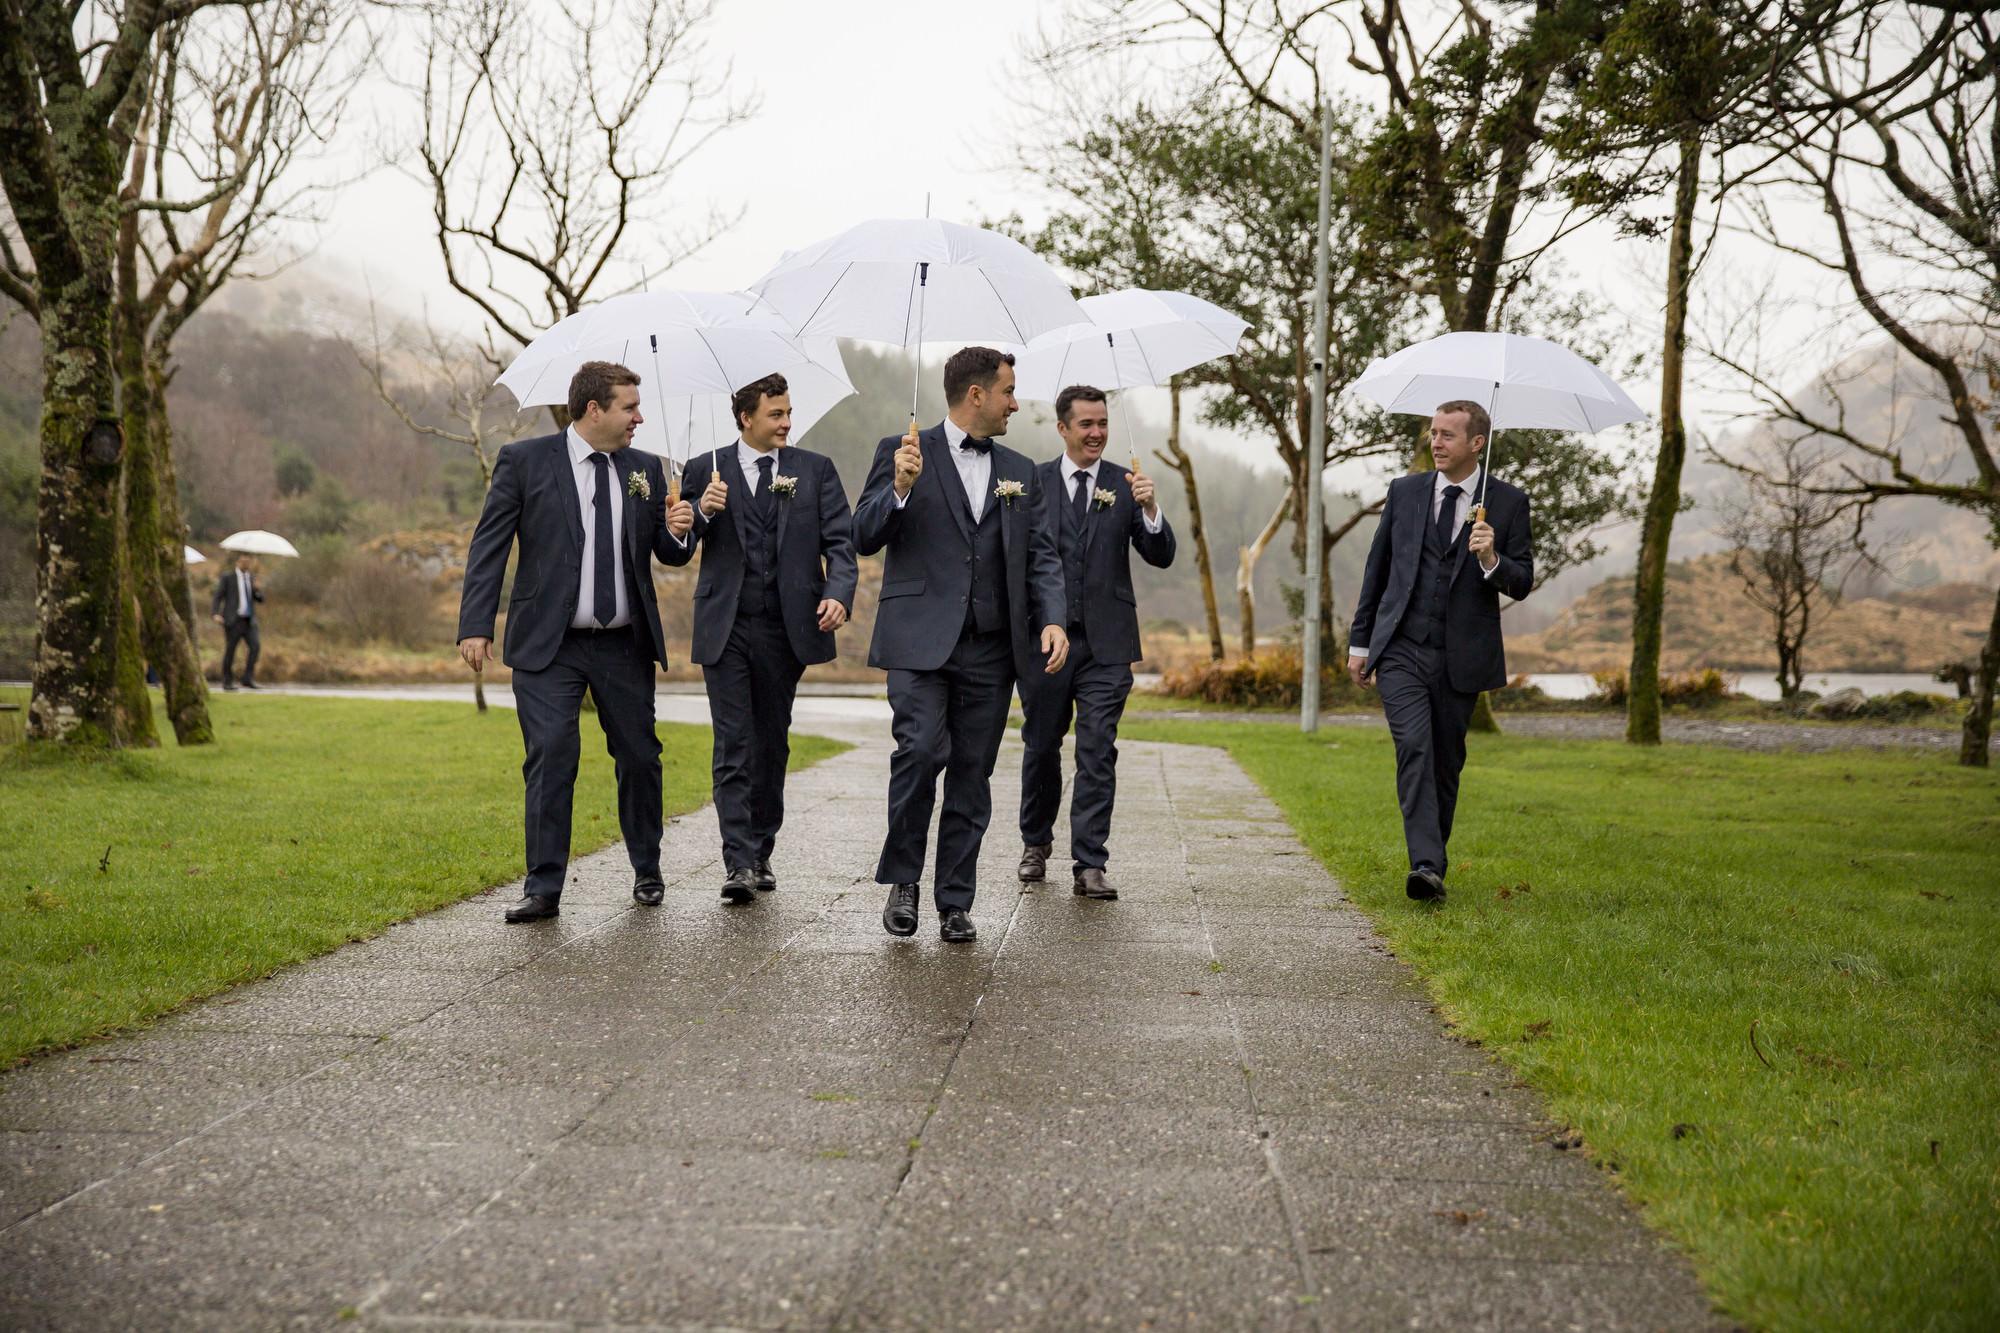 muckross_park_hotel_grougane_barra_wedding_photographer_goldenmoments_029.jpg